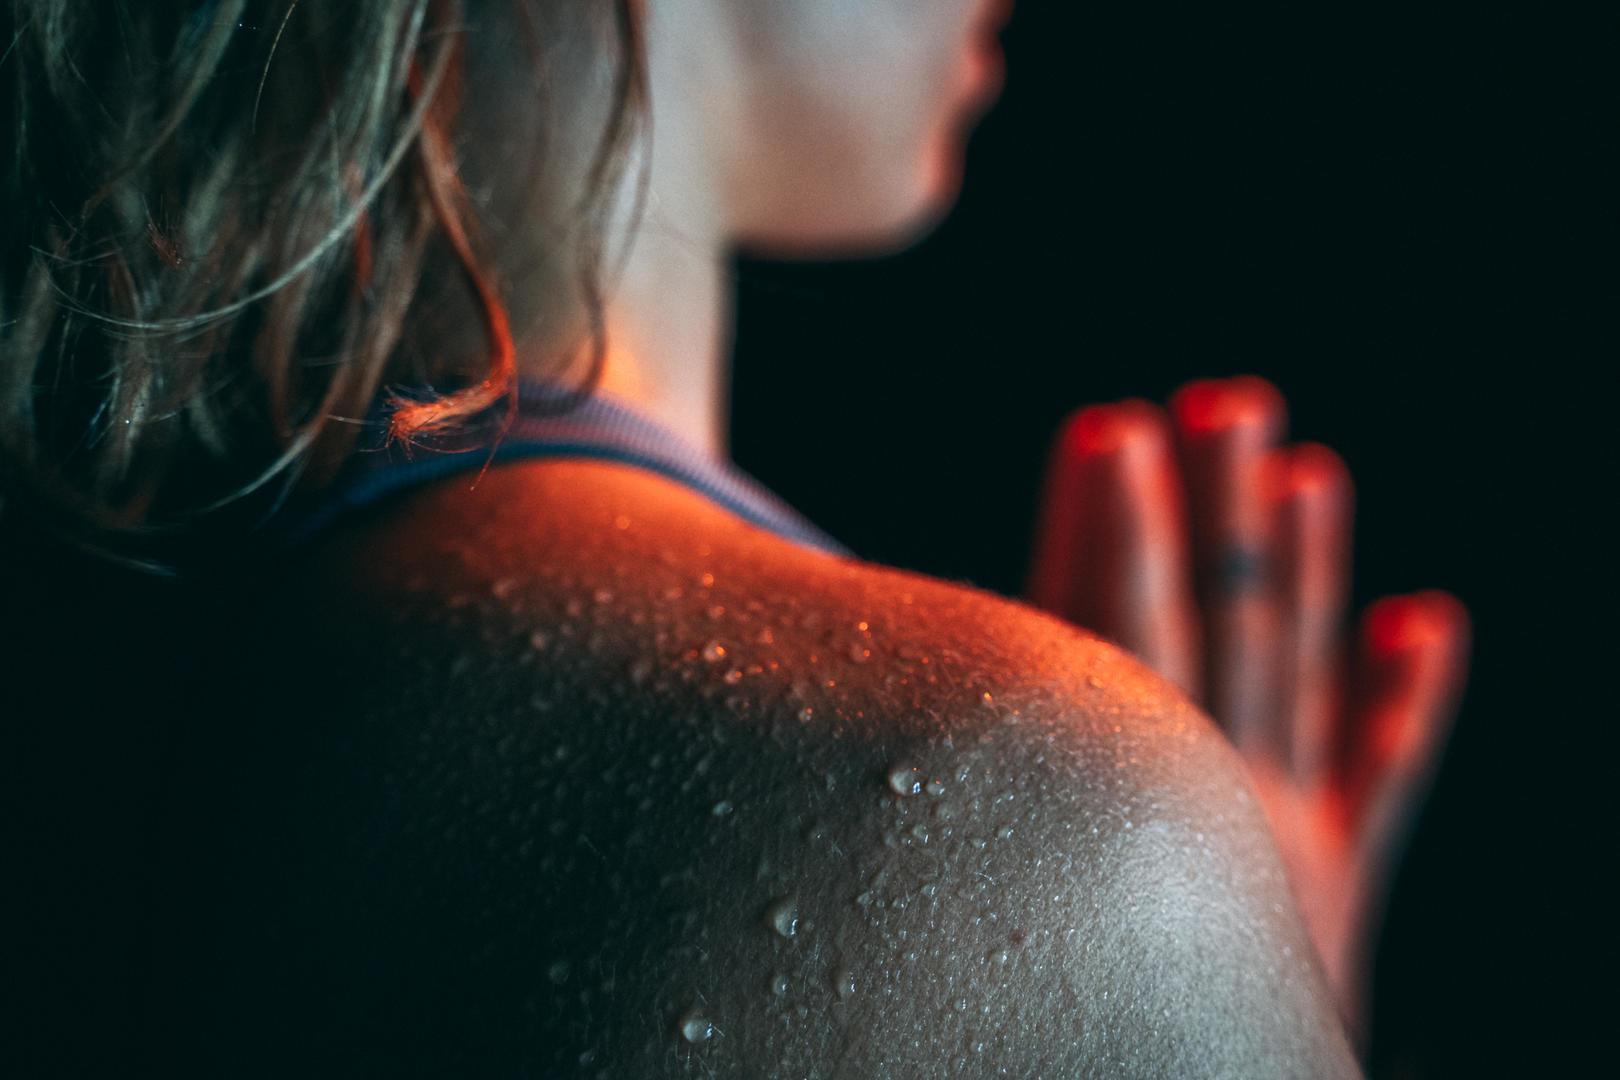 Therapeutic Hot yoga